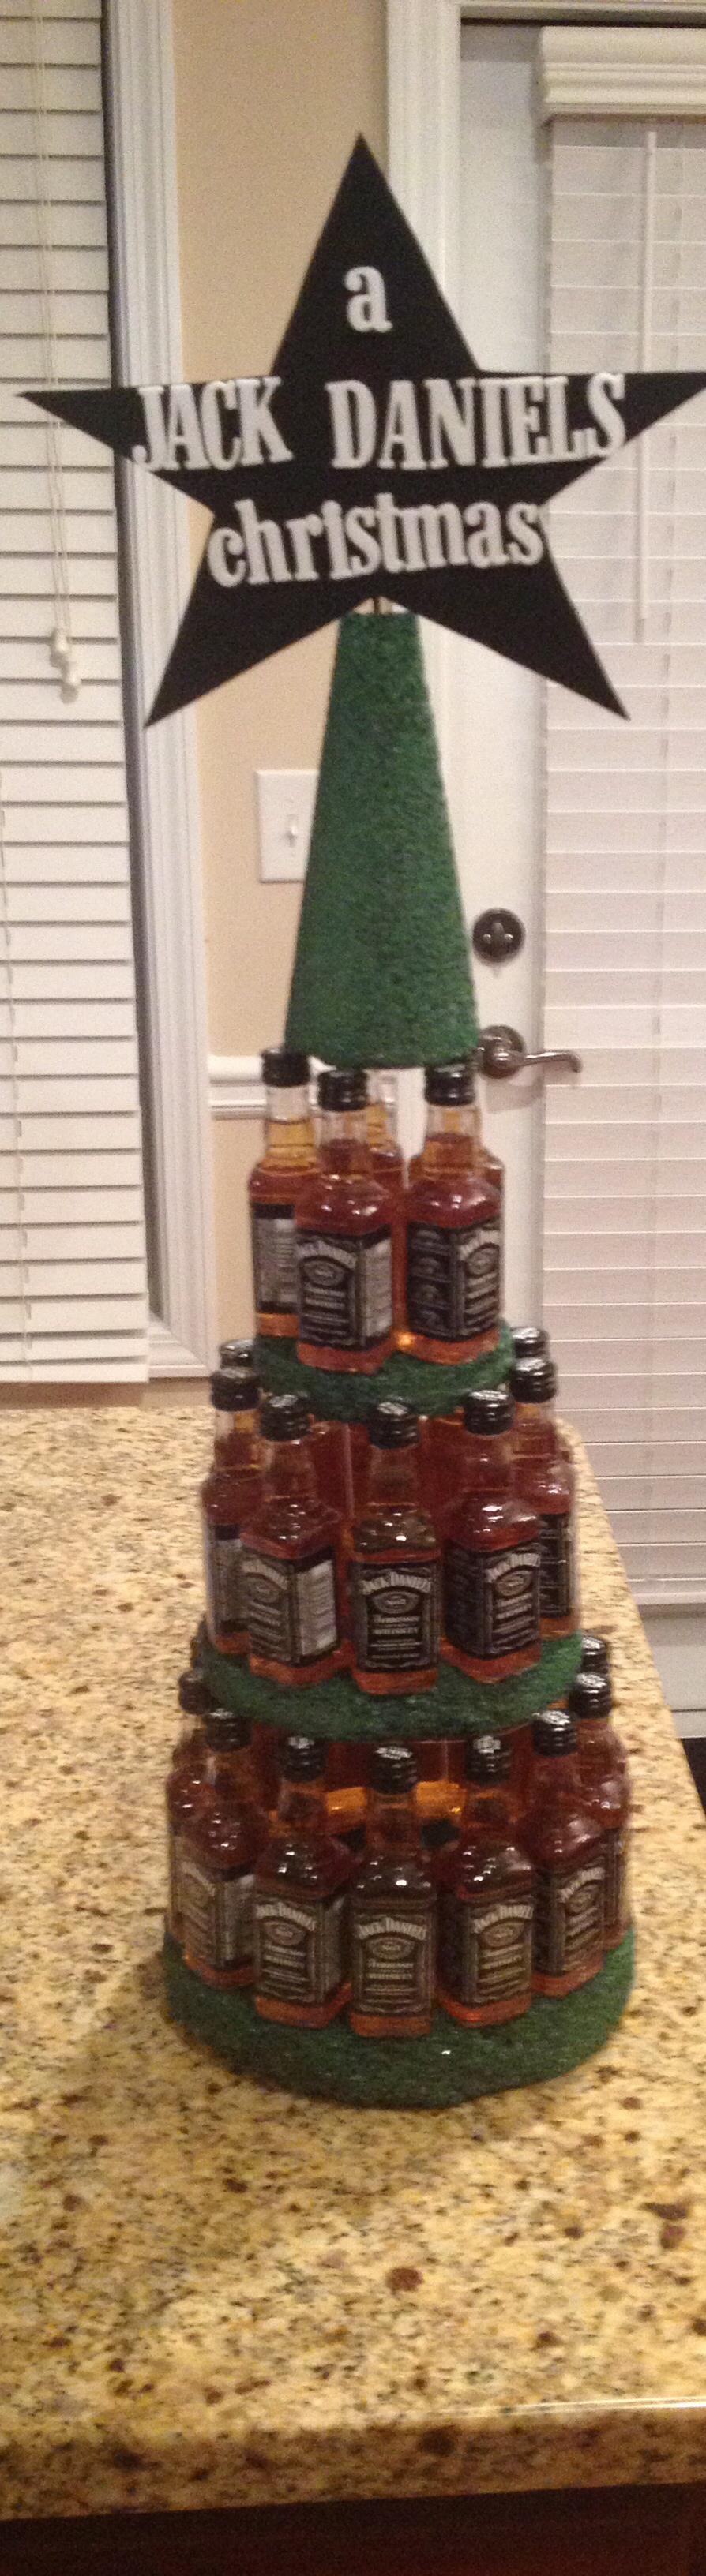 Jack Daniels Christmas tree   Crafty   Pinterest   Jack daniels ...